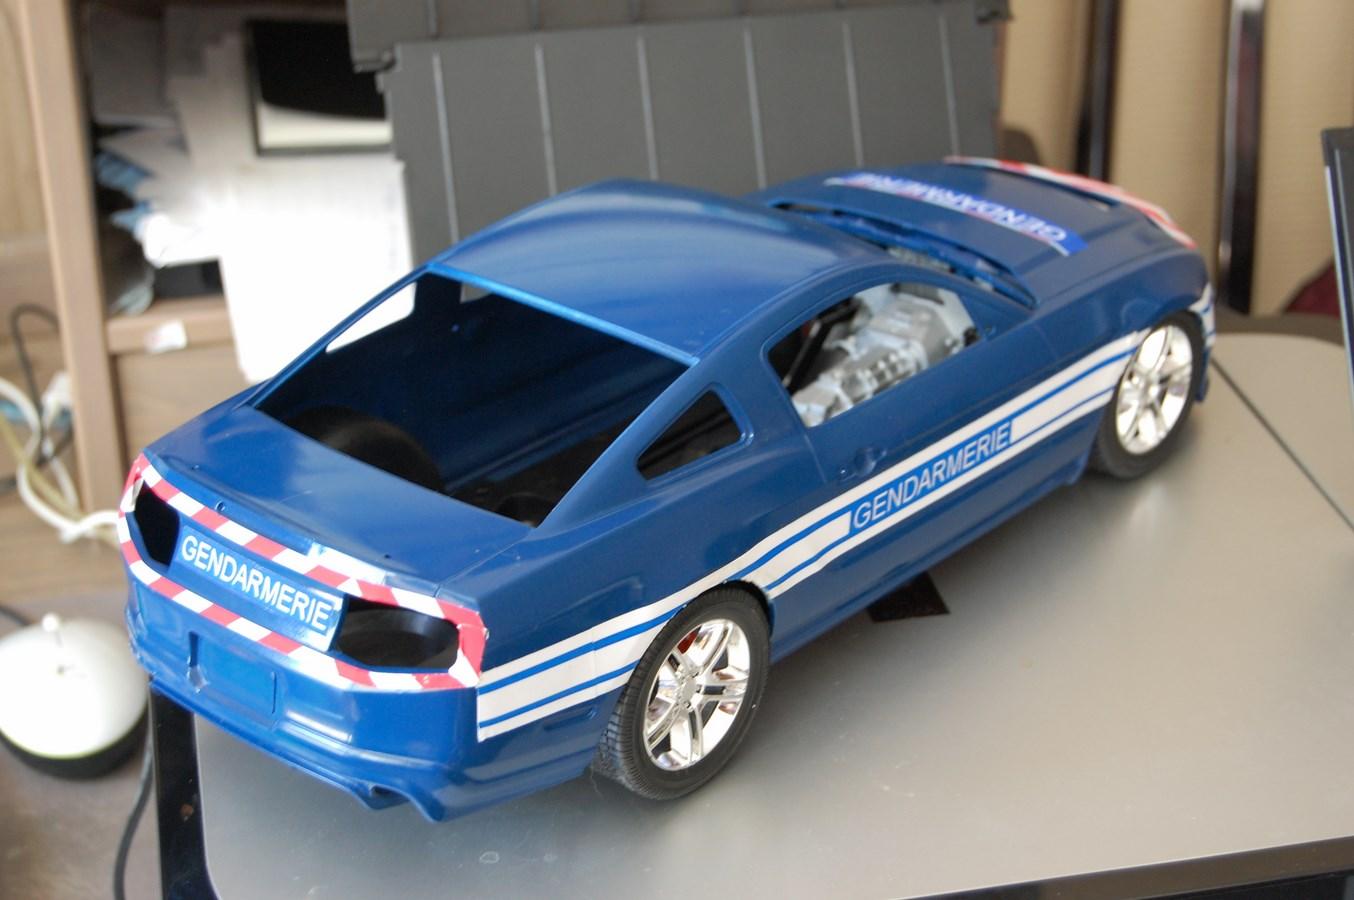 Shelby GT 500 version imaginaire Gendarmerie - Page 2 657400Mustag26Copier